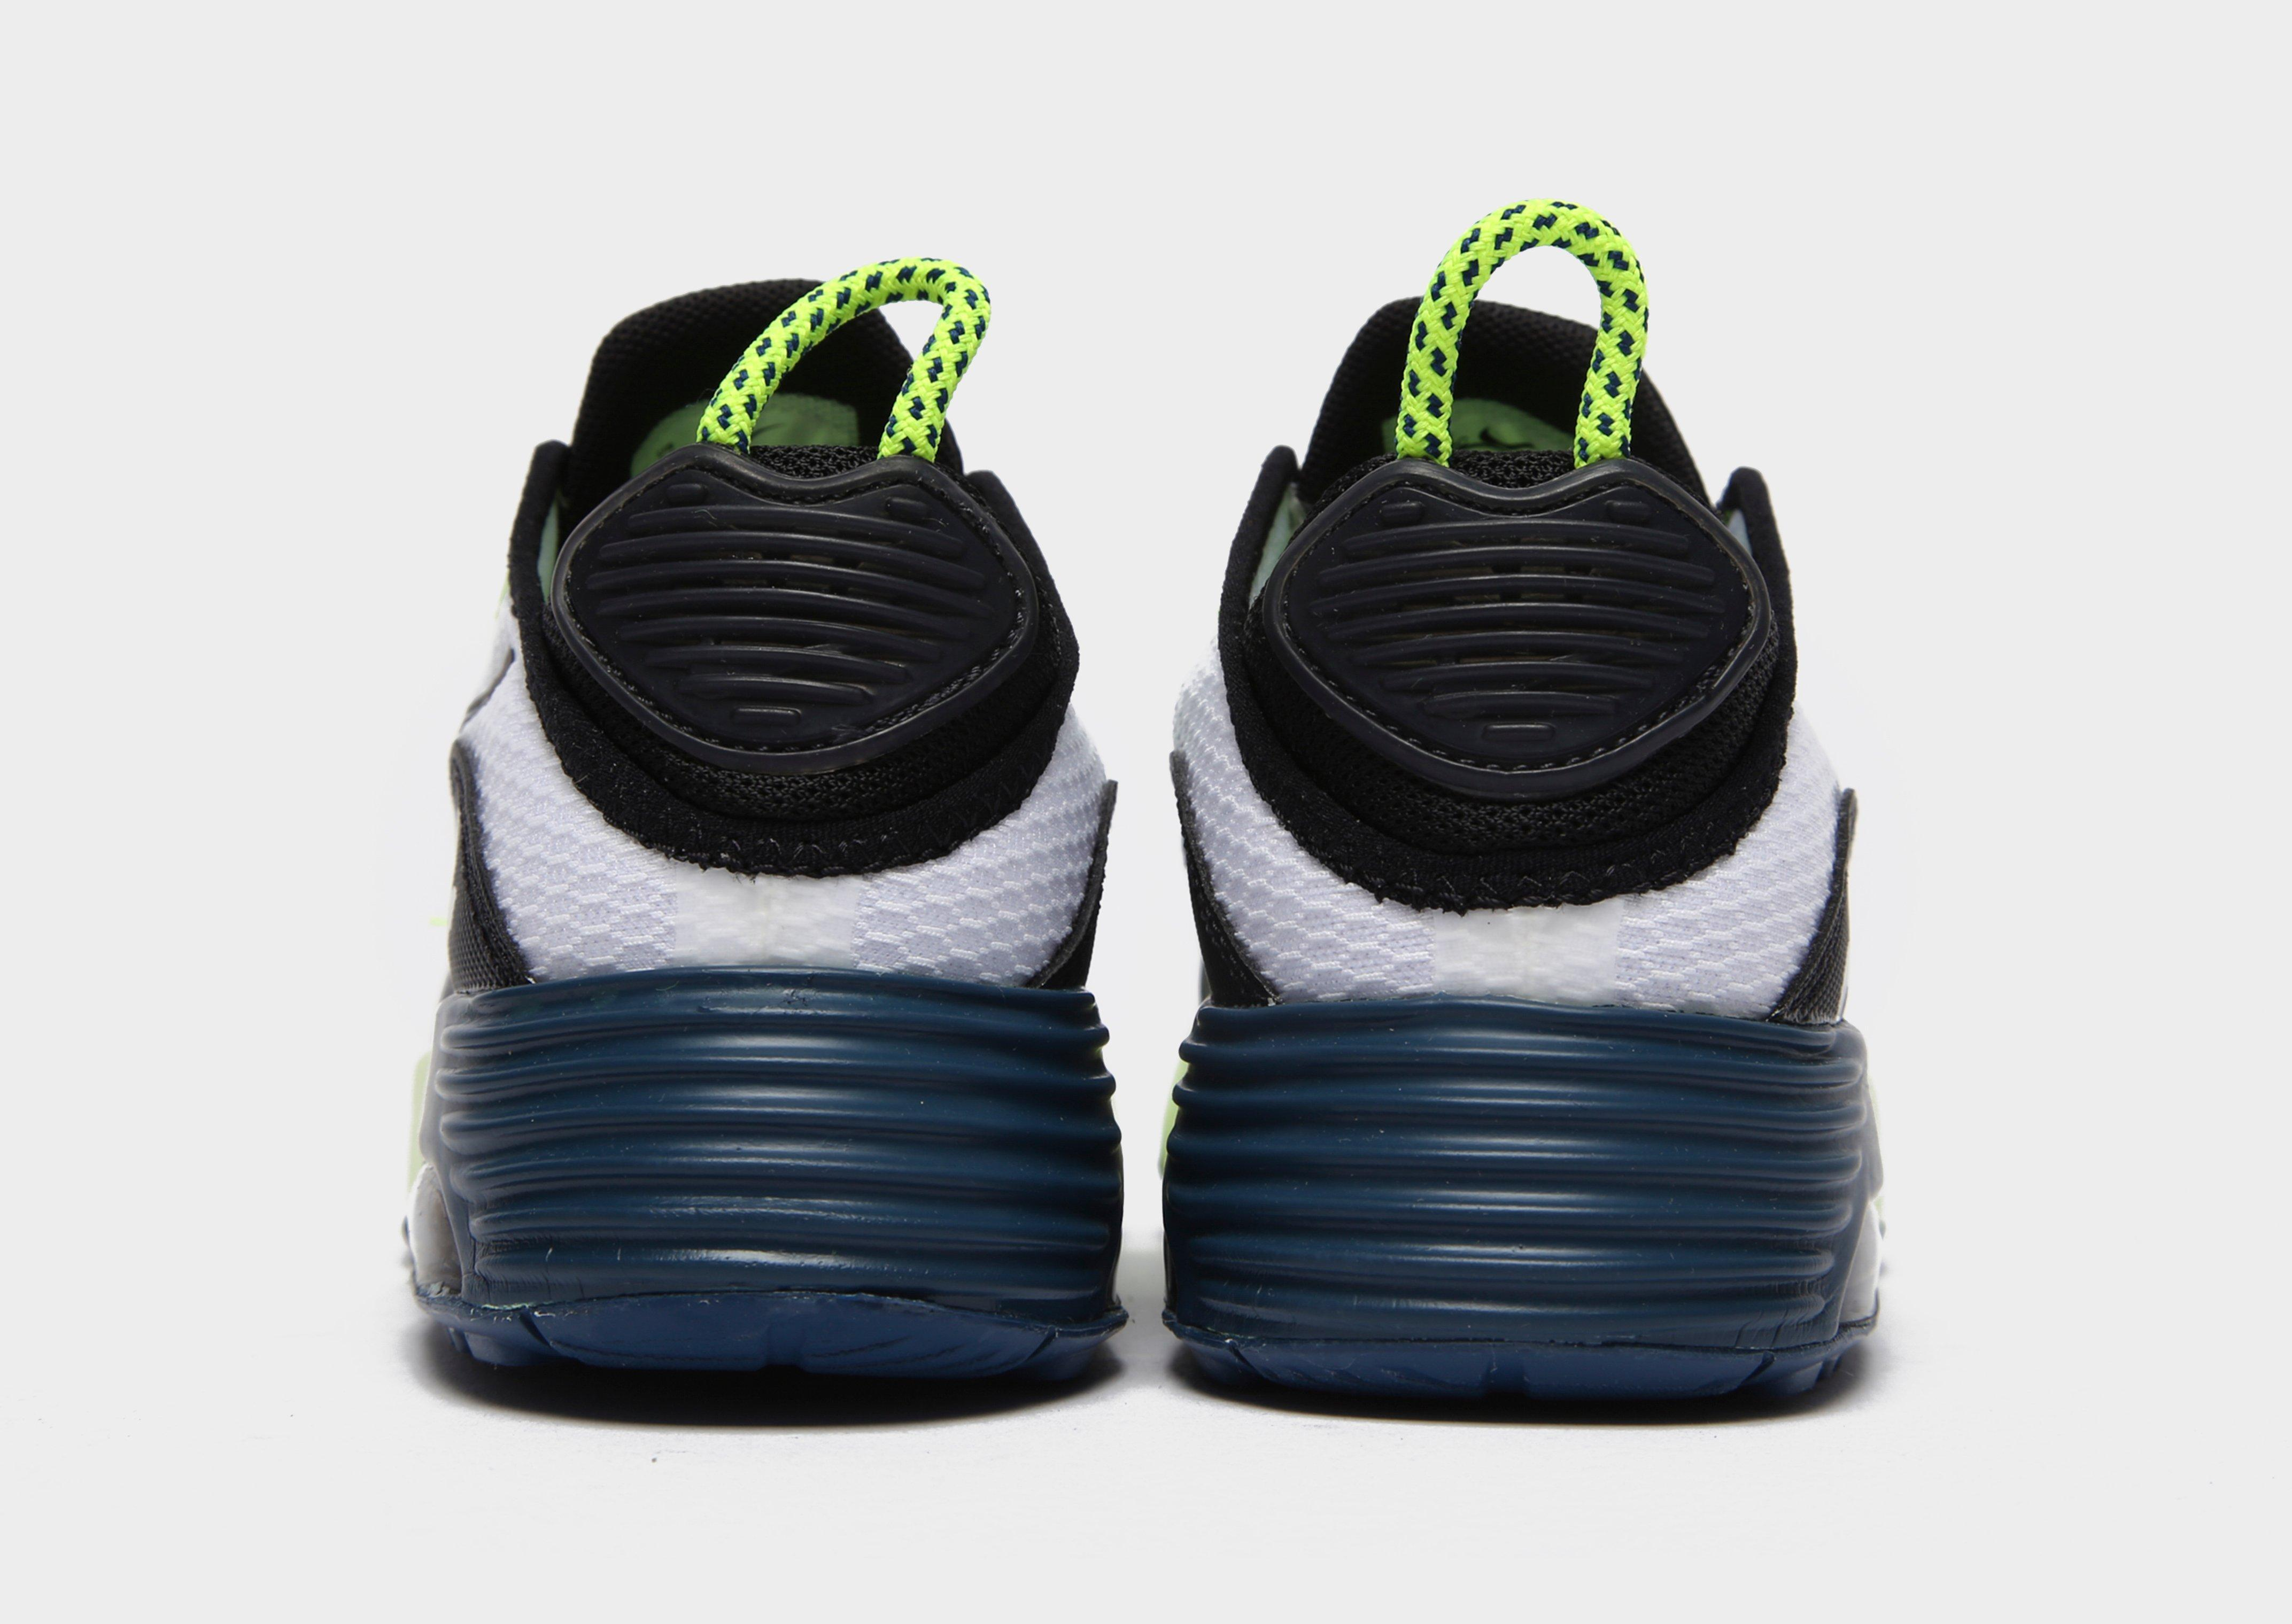 Cheap Nike Max 2090 Shoes